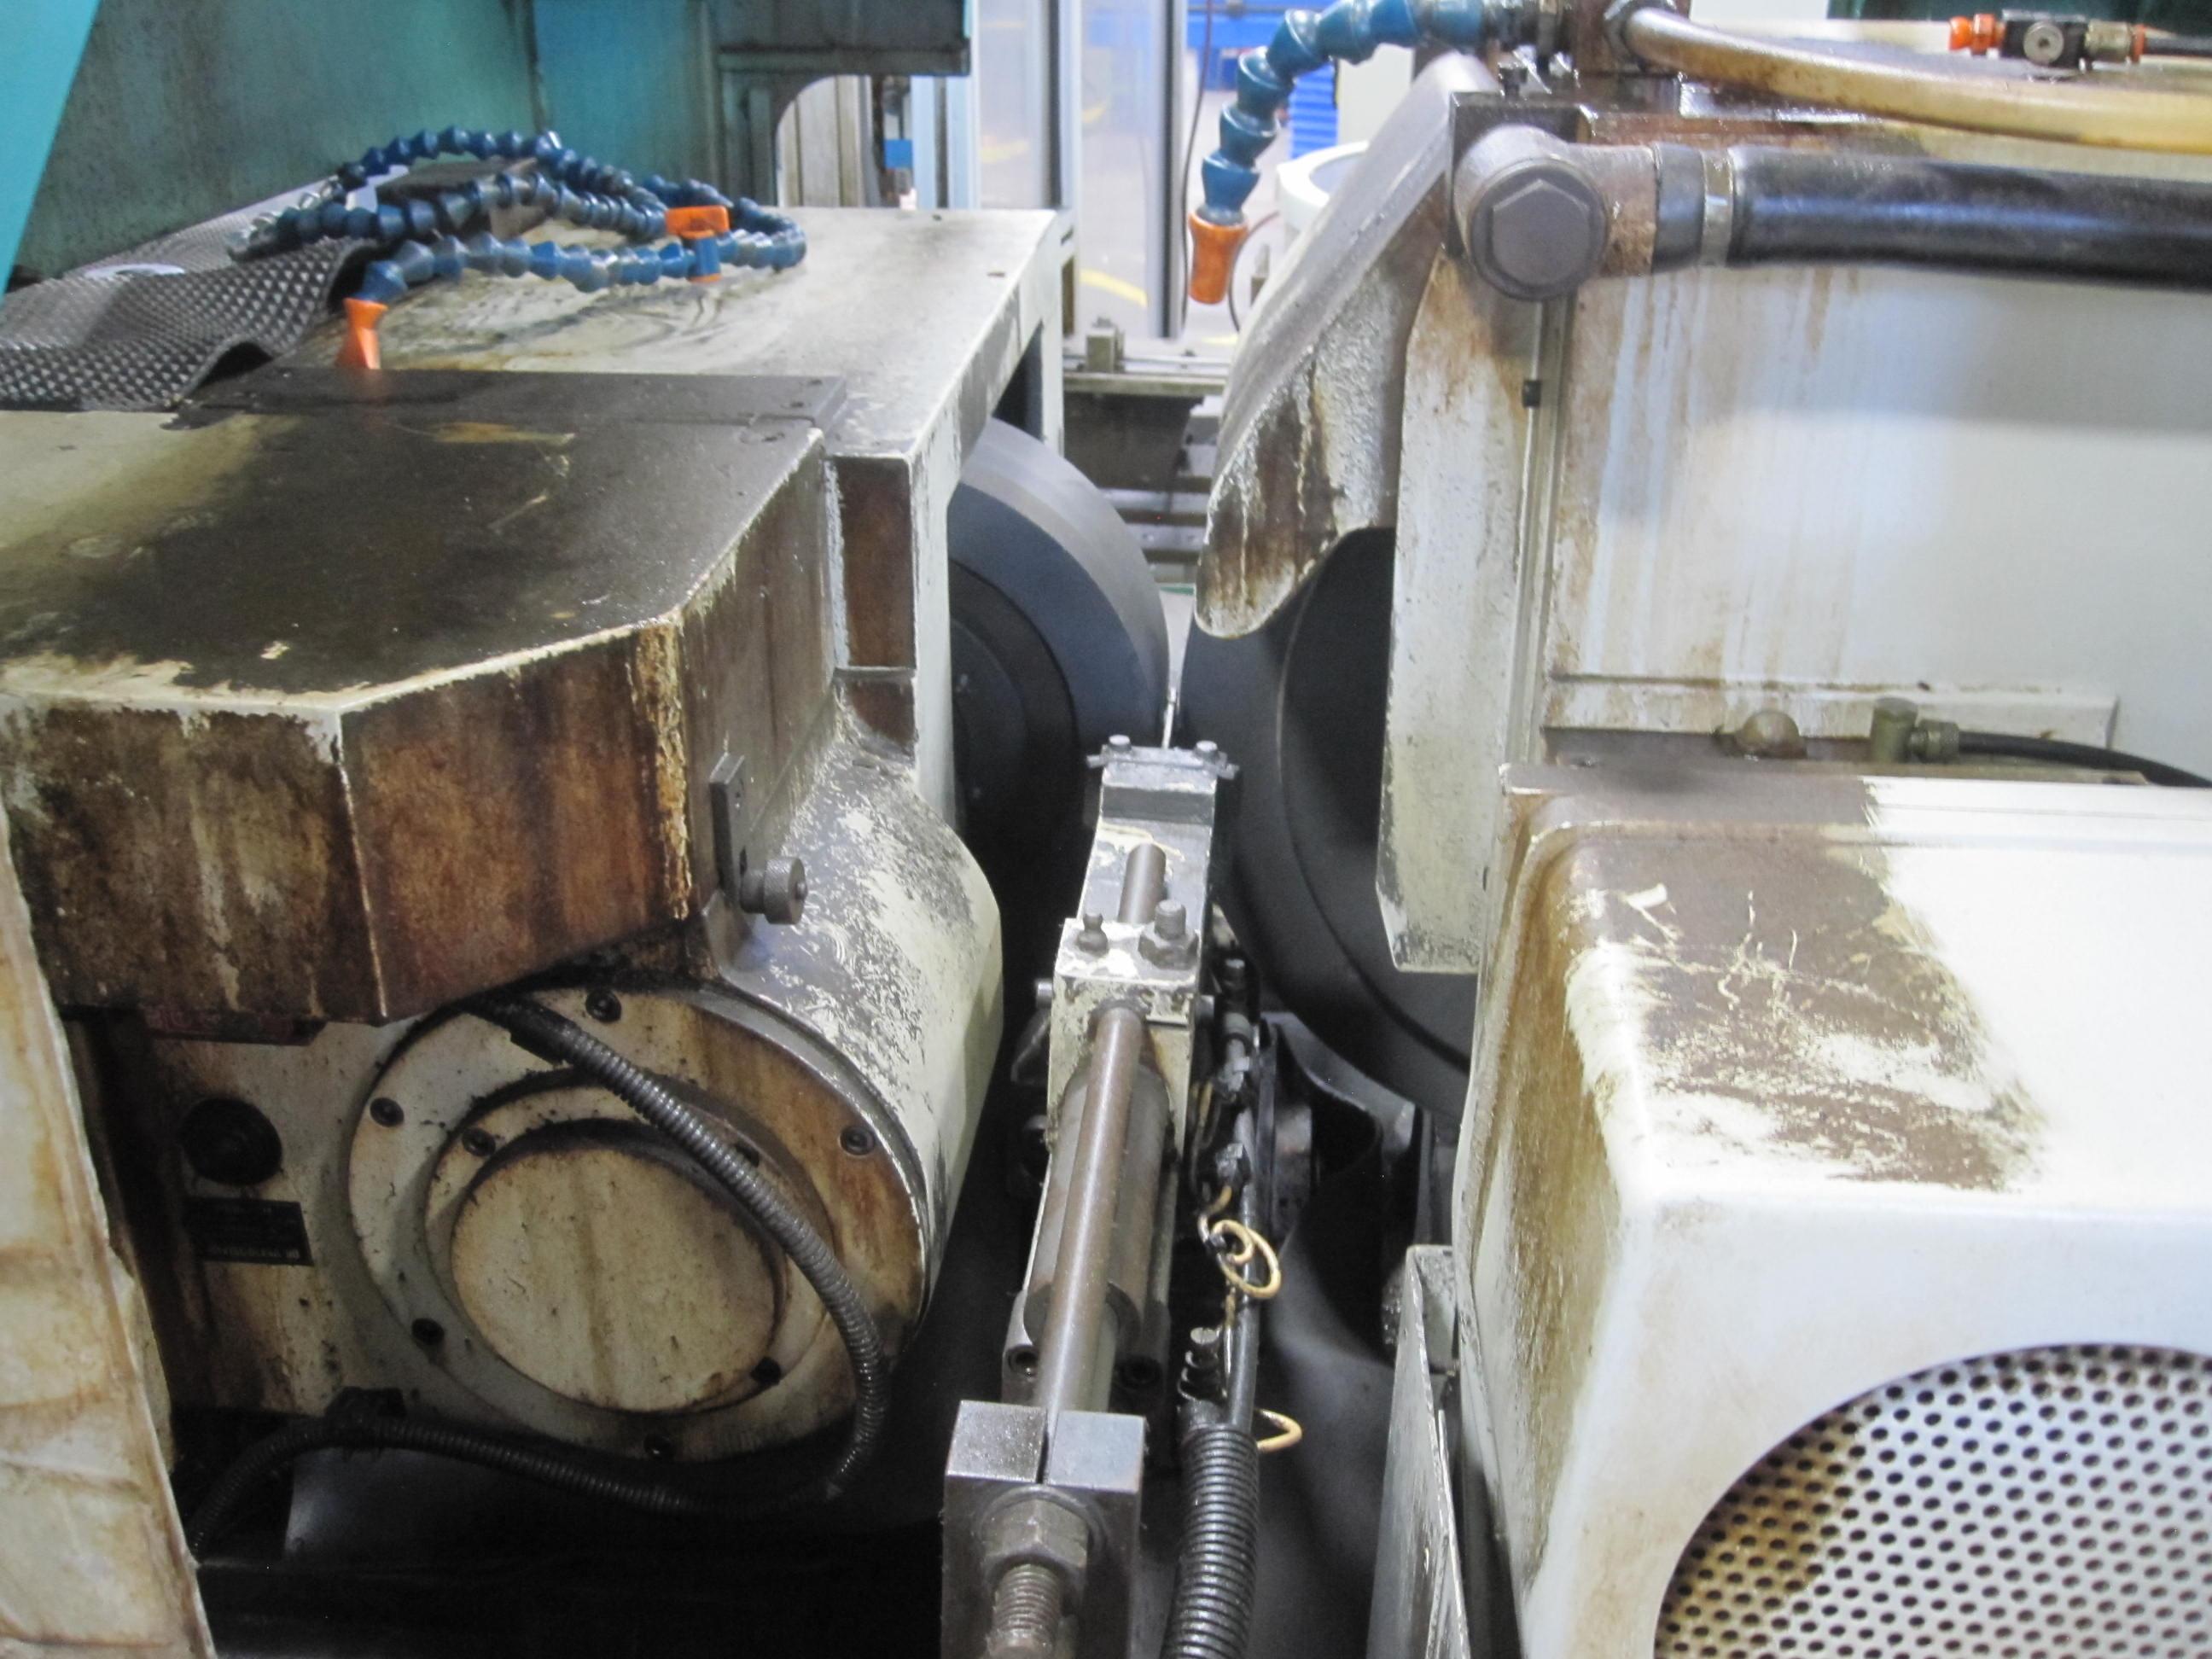 Monza Model 510 CNC Centerless Grinder